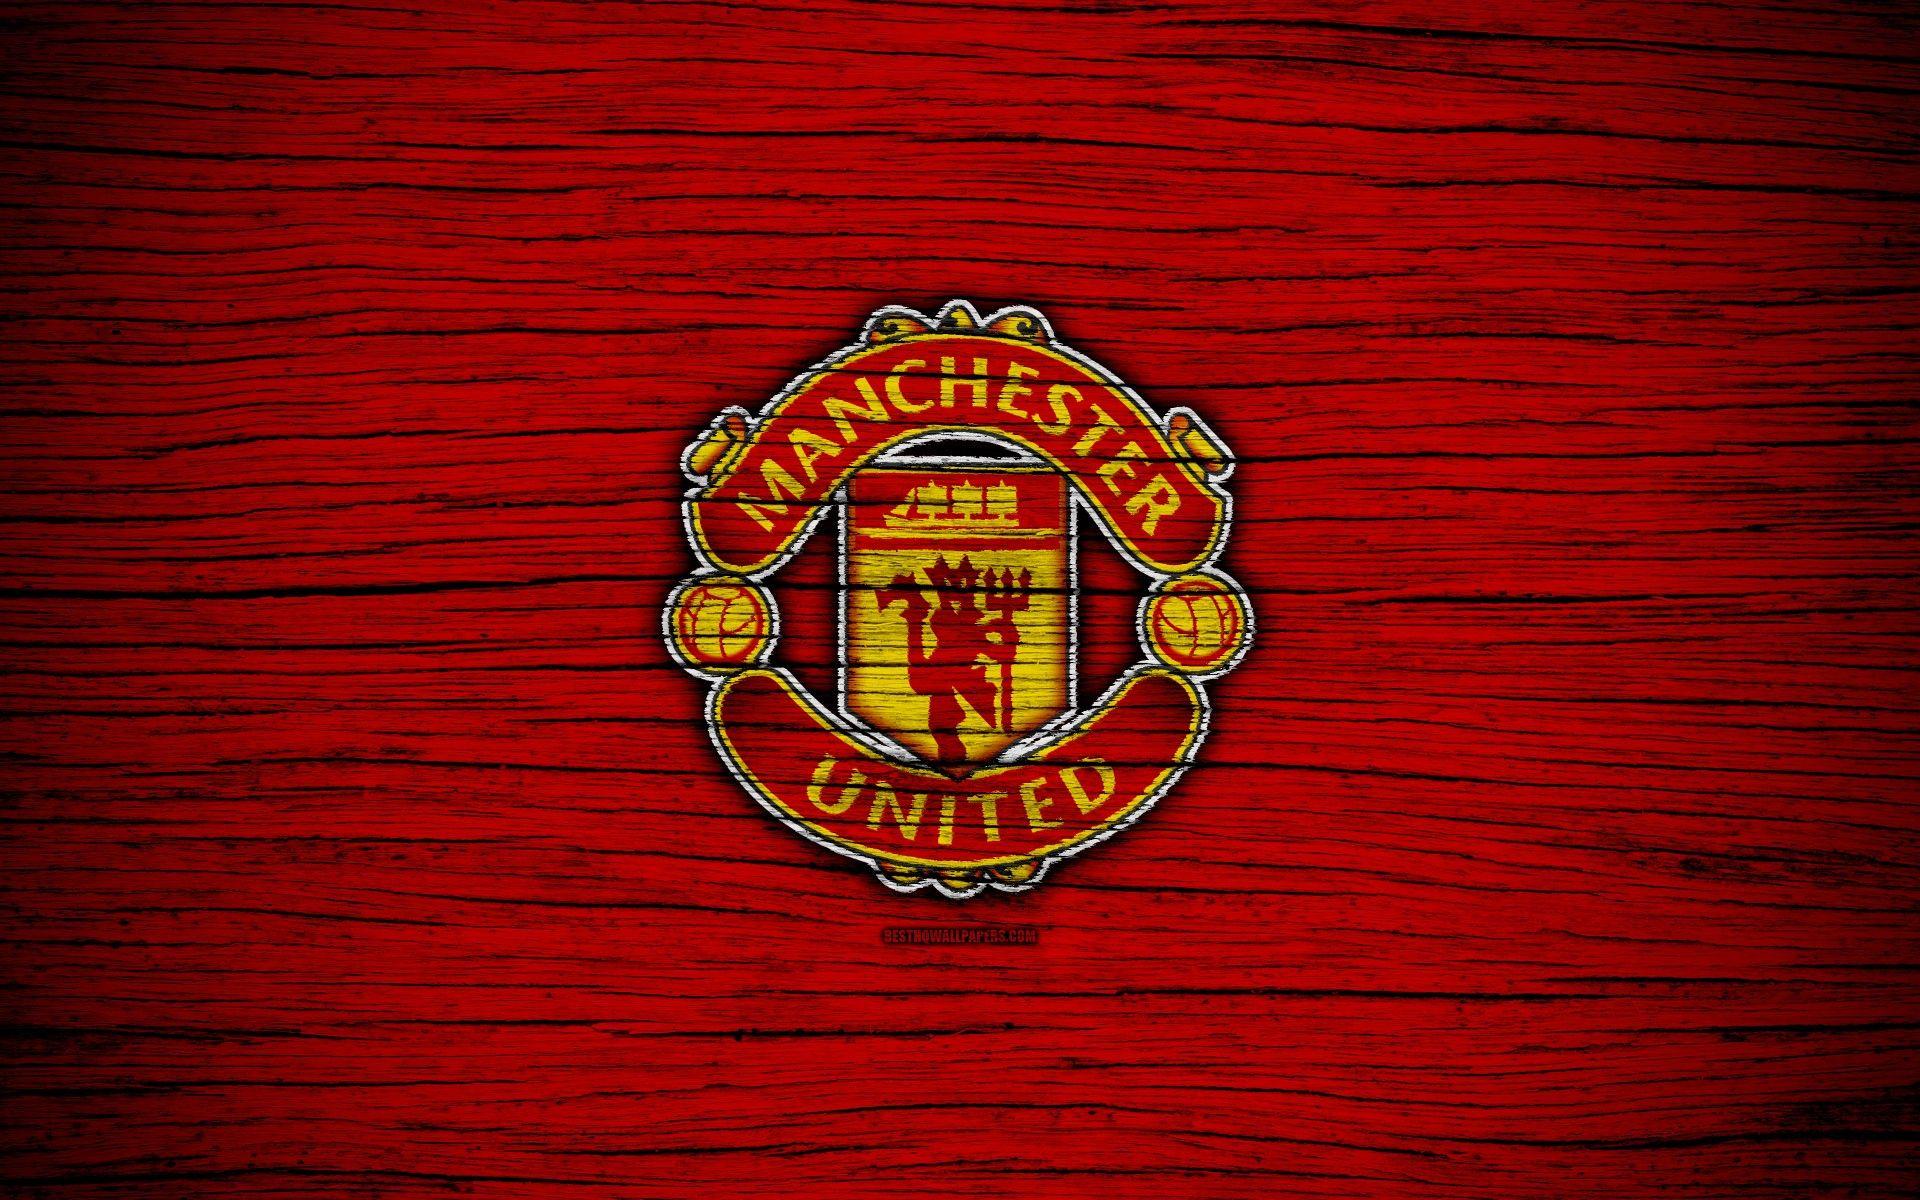 Man United 4k Manchester United Wallpaper Manchester United Logo Manchester United